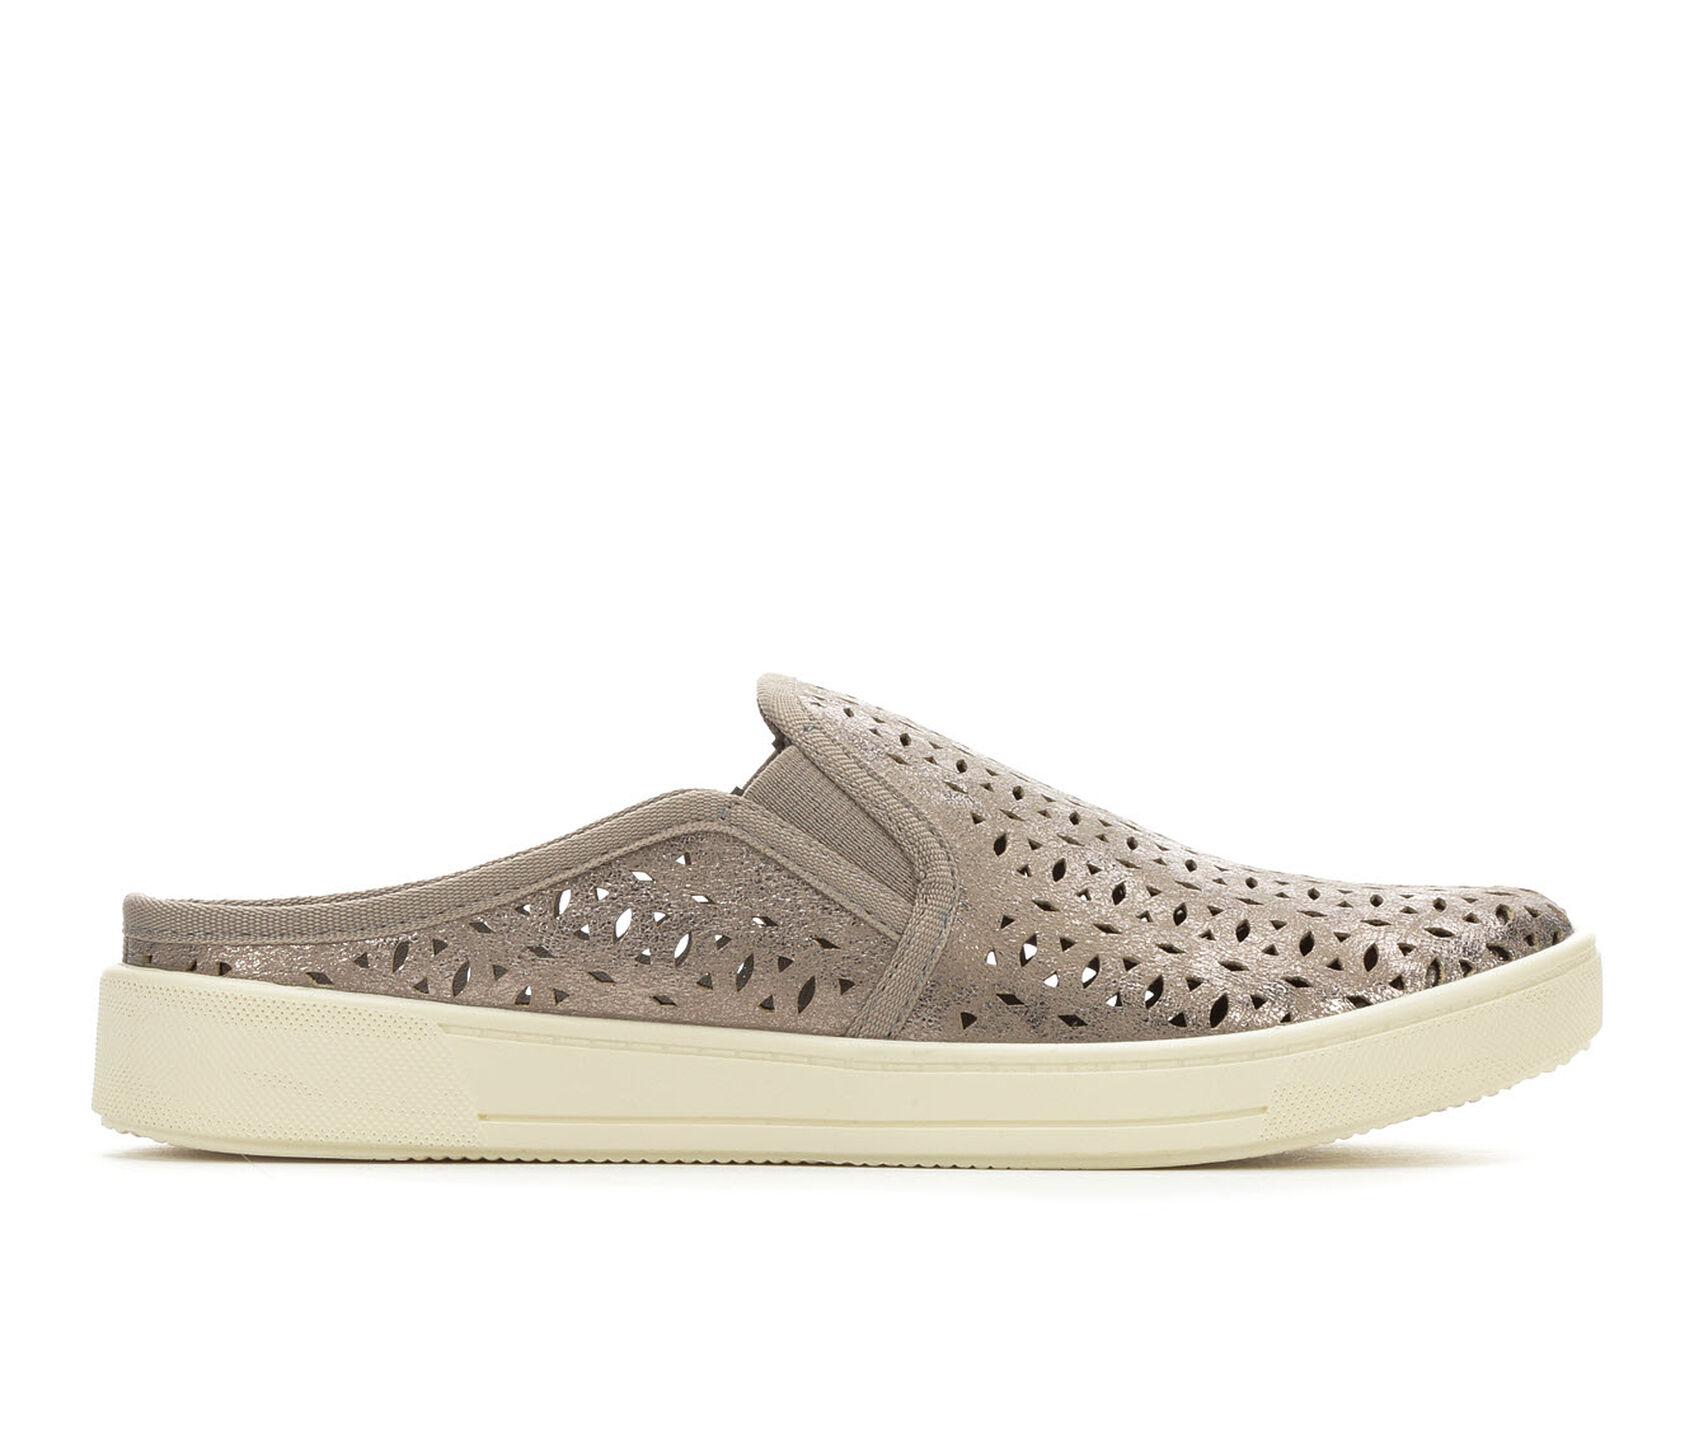 c90b2f618fccb Women's Vintage 7 Eight Macie Slip-On Sneakers